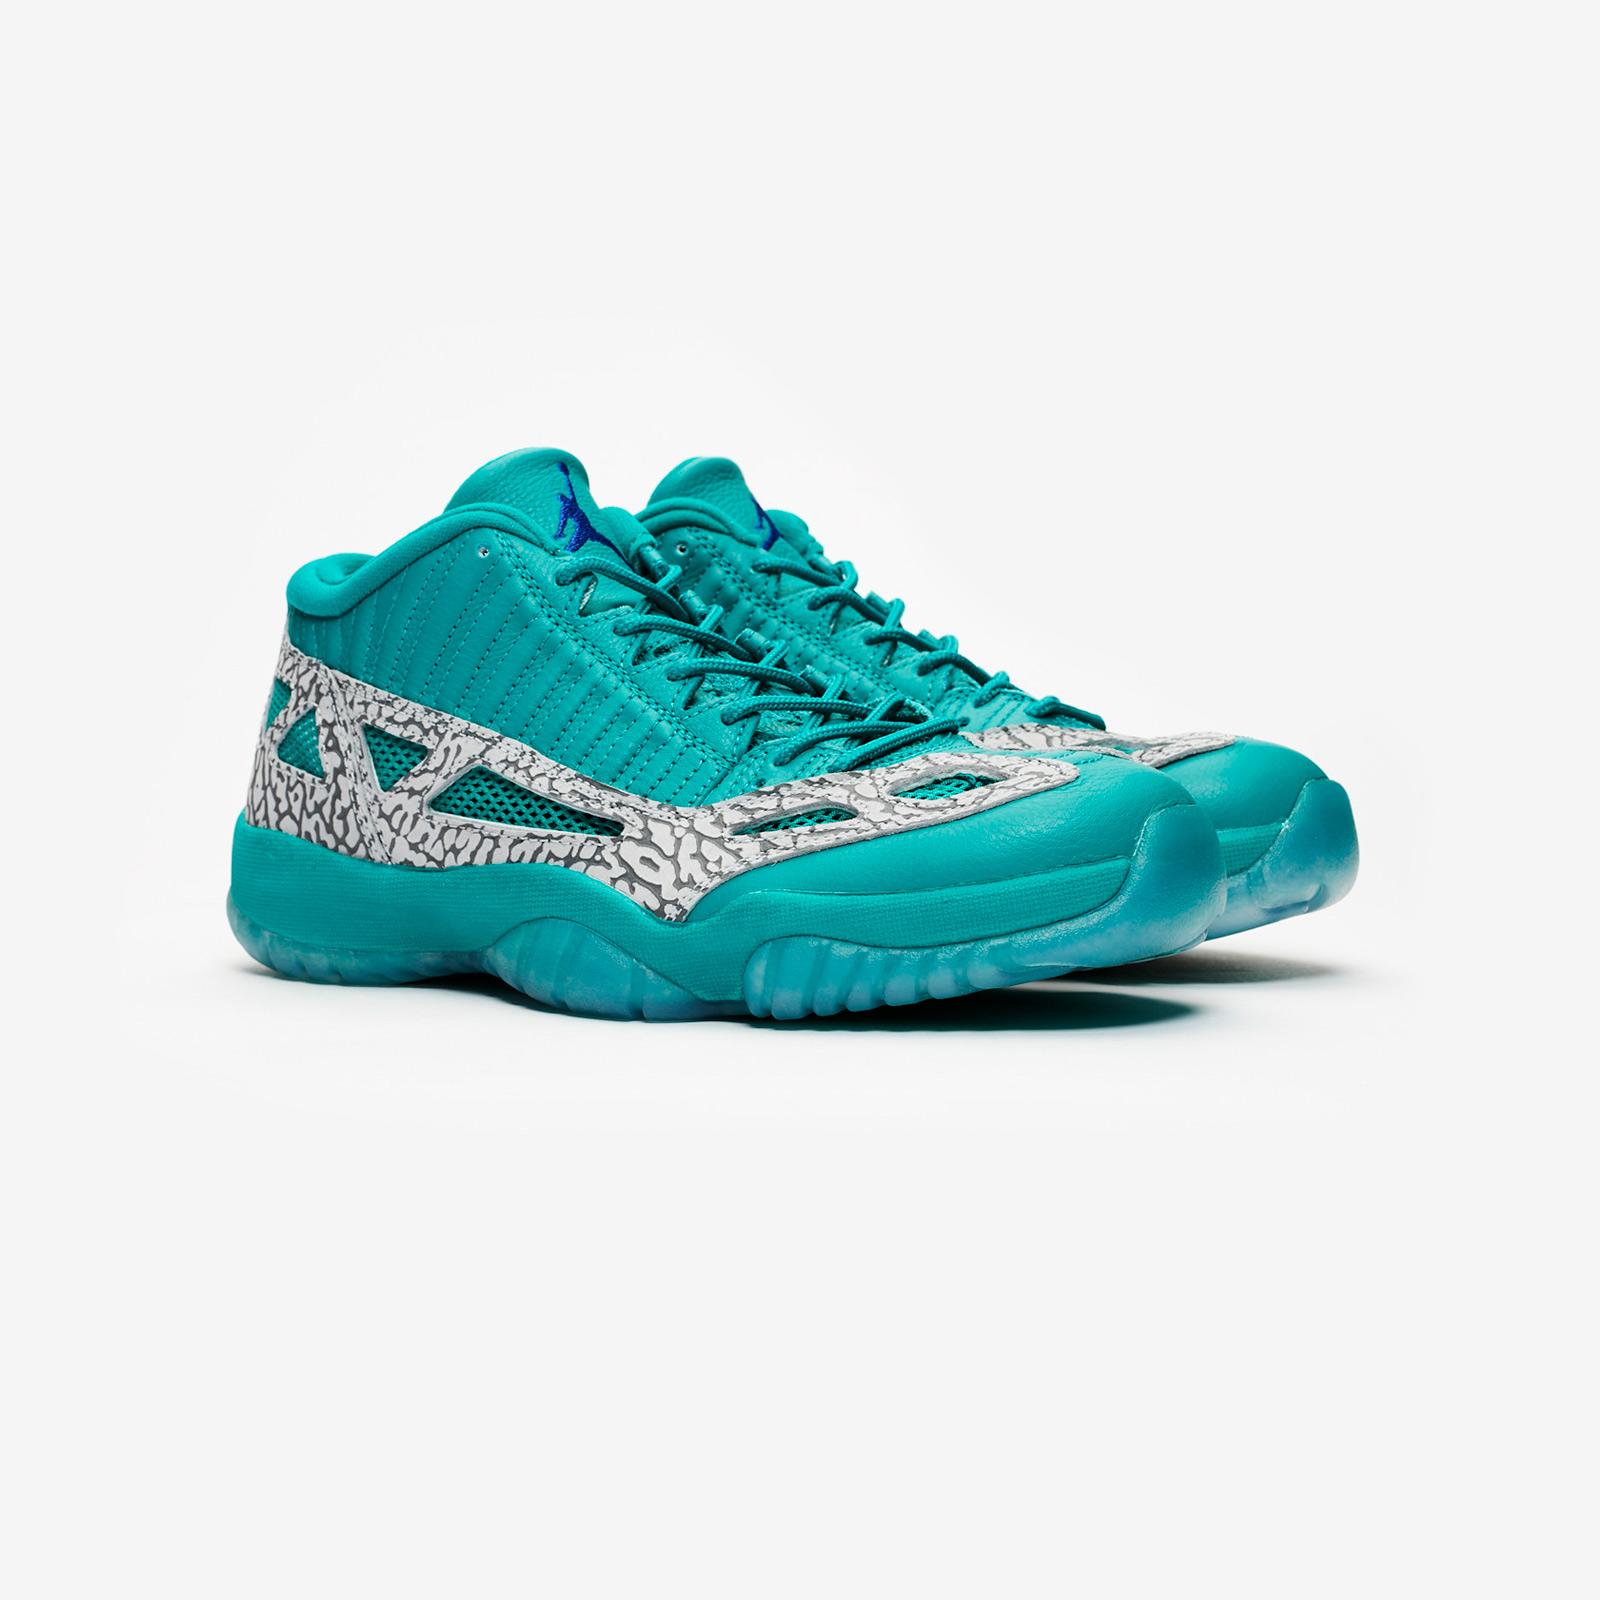 Jordan Brand Air Jordan 11 Retro IE - 919712-300 - Sneakersnstuff ... ba53abe19